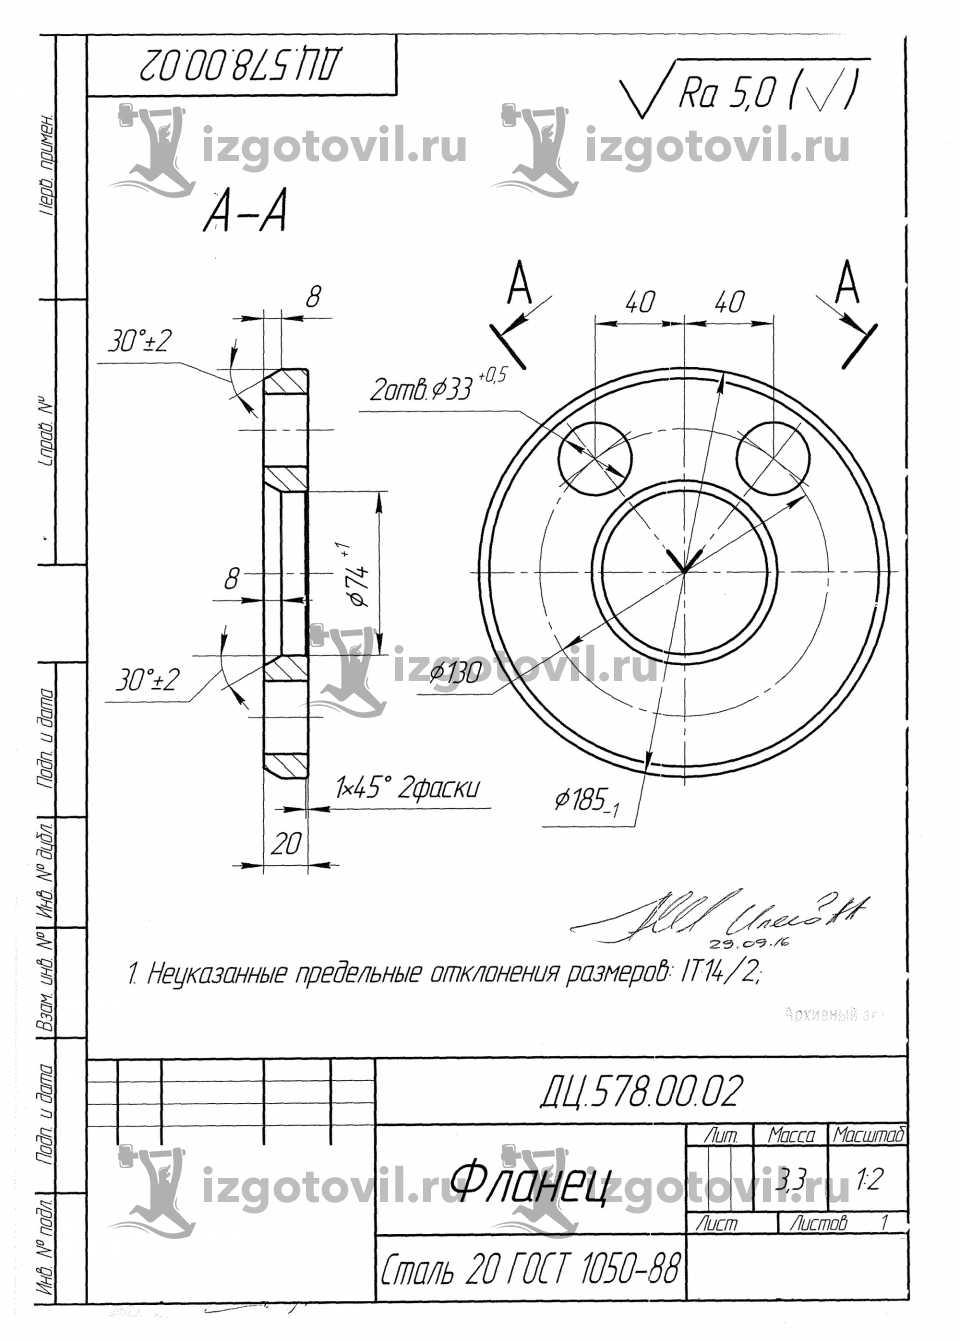 Токарно-фрезерная обработка - фурма шлаковая